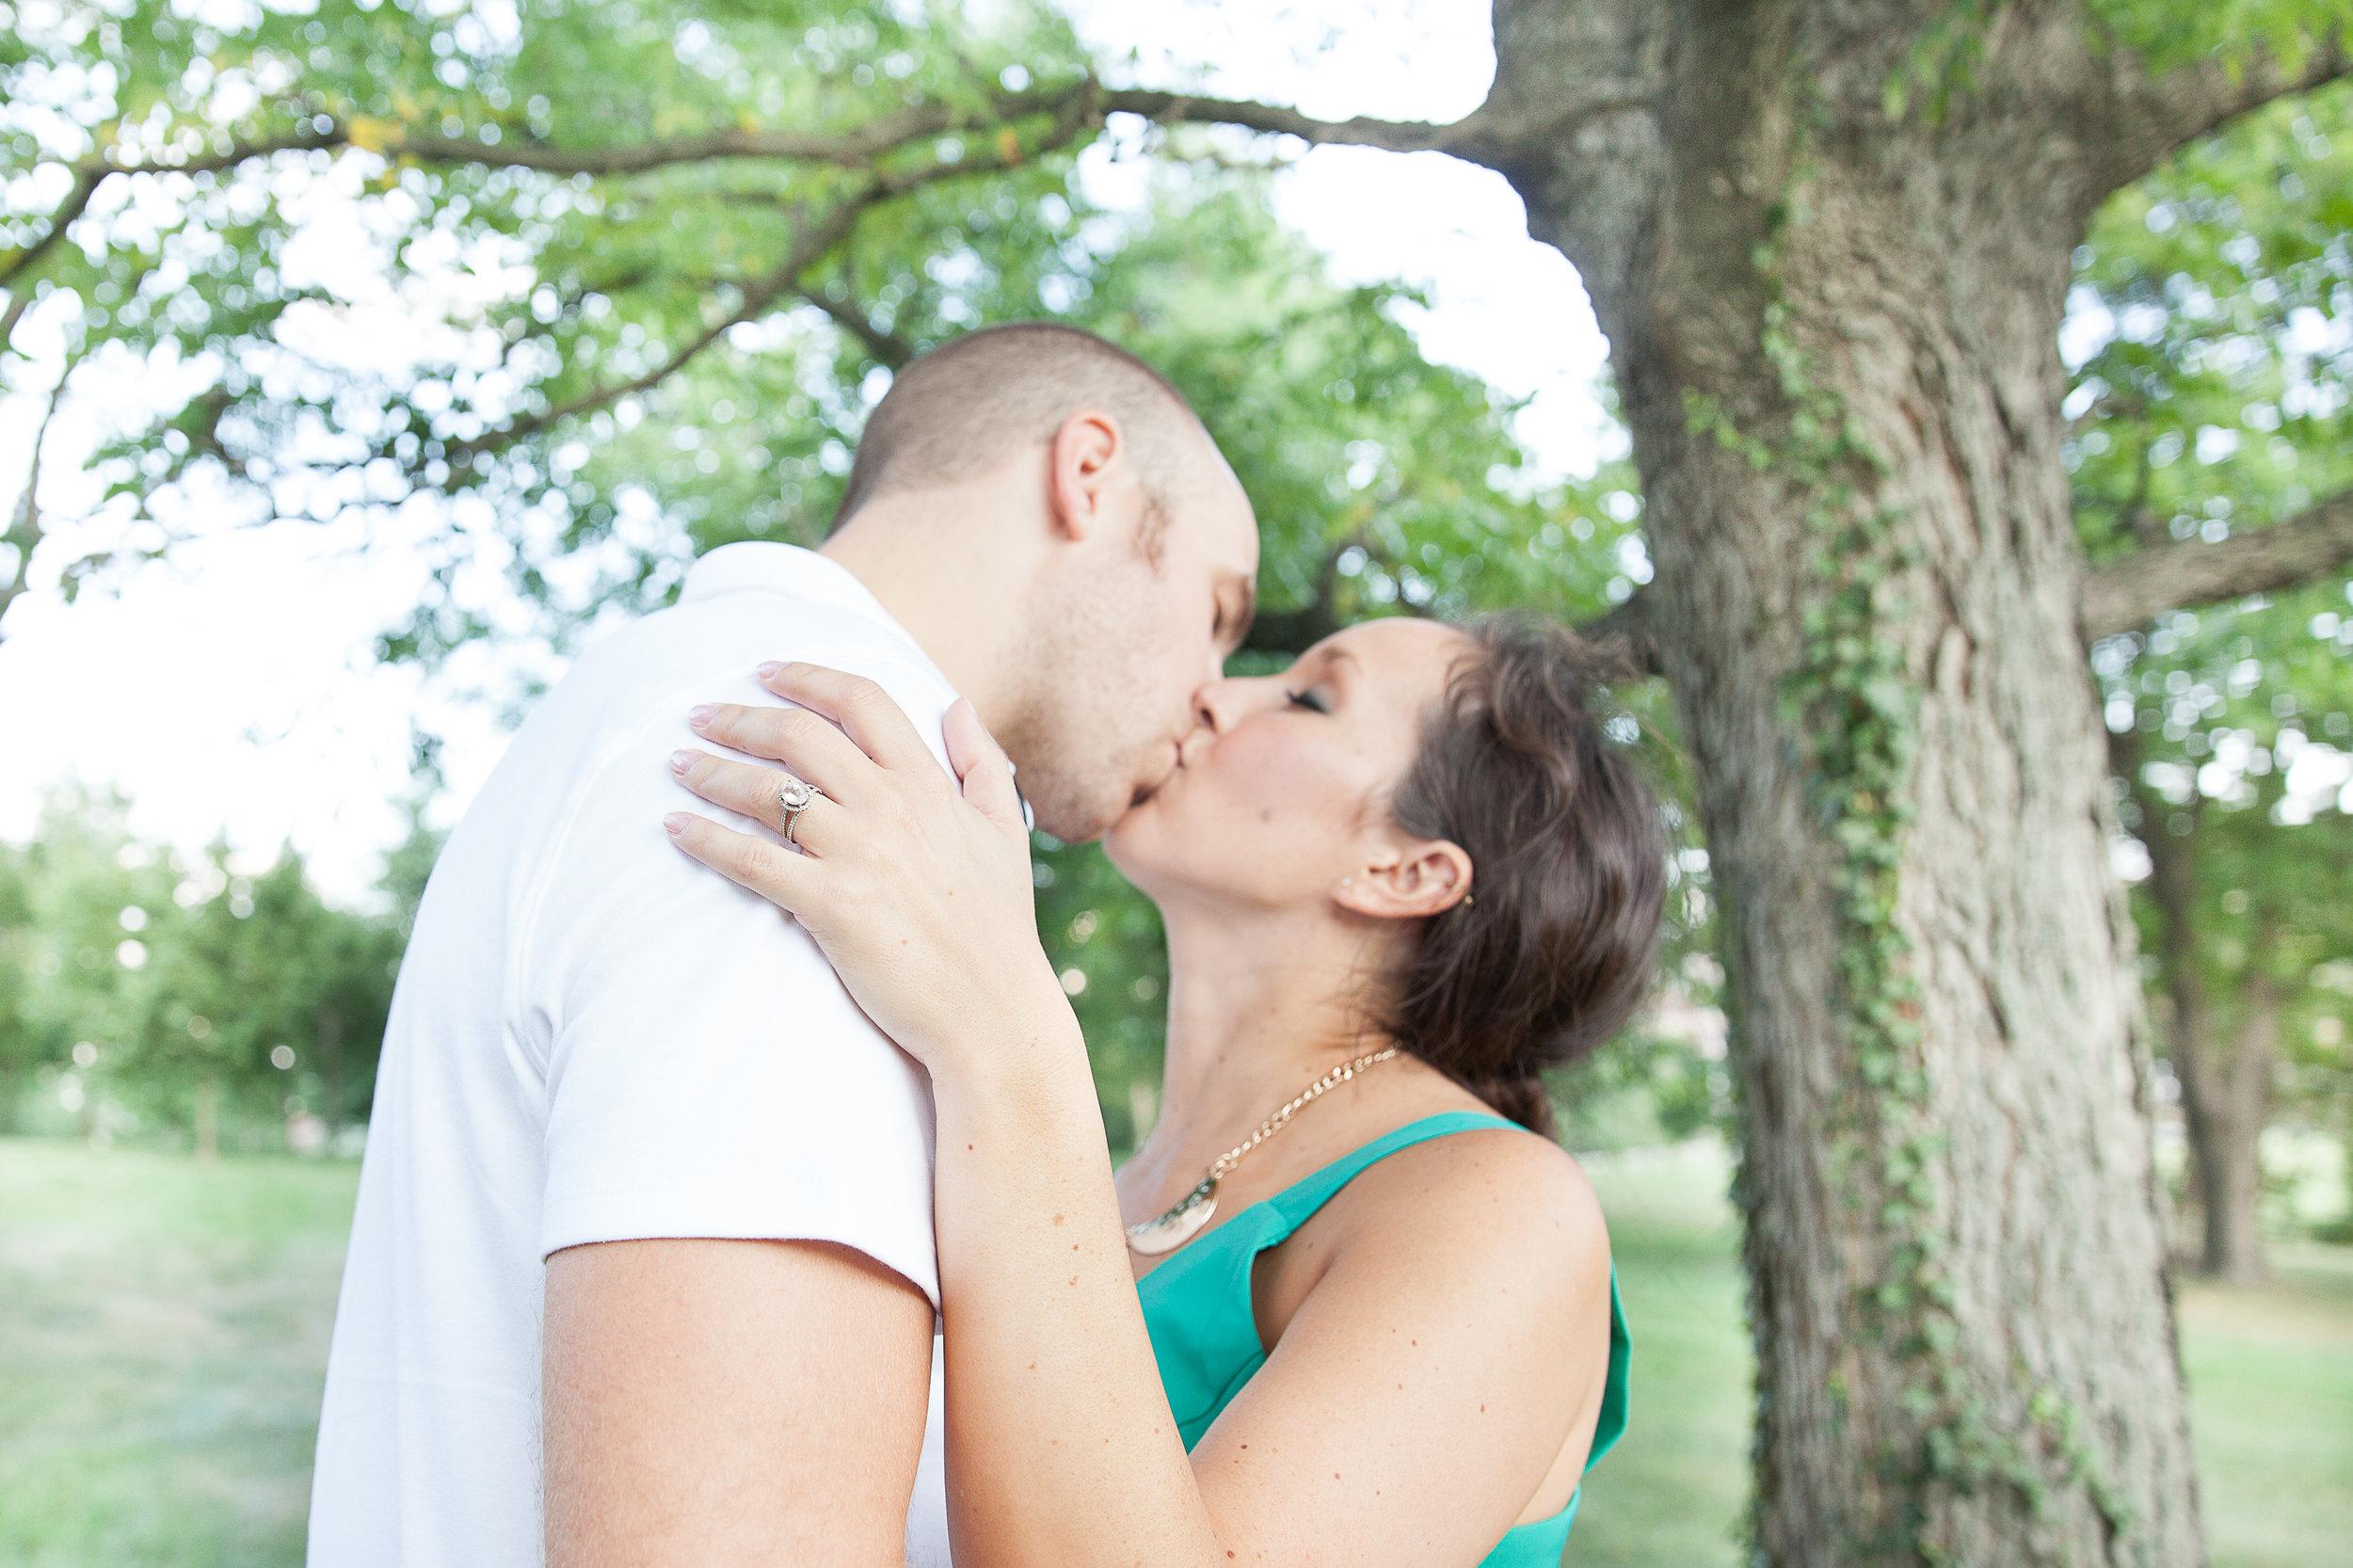 Marissa-Timon-Engagement-Kim-Pham-Clark-Photography-20.jpg